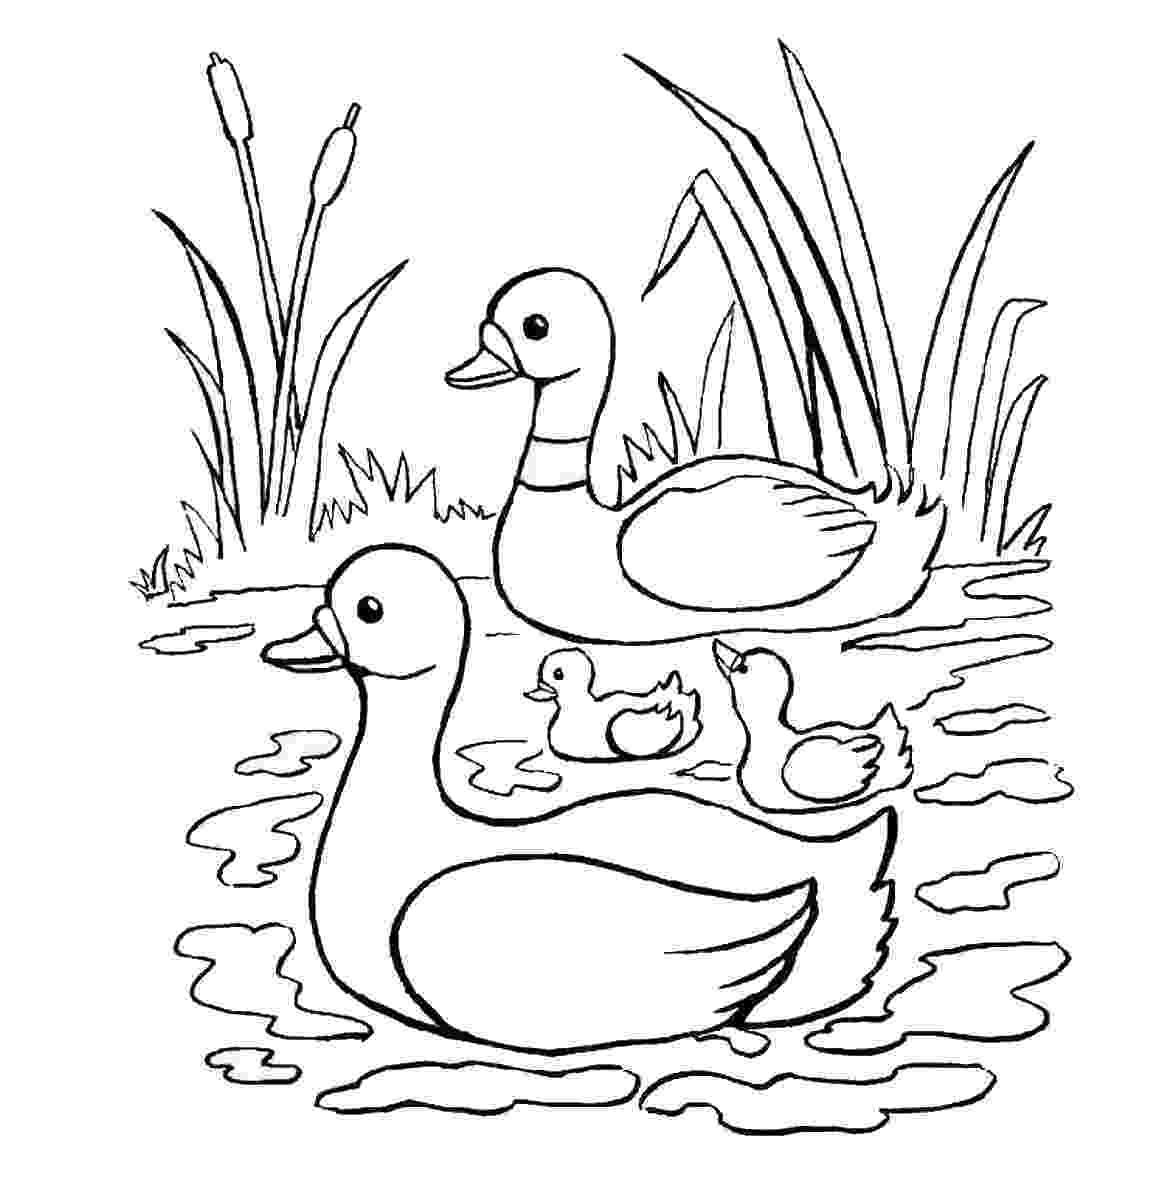 fotos de patos para colorear donald duck drawing how to draw donald duck easy fotos de para patos colorear